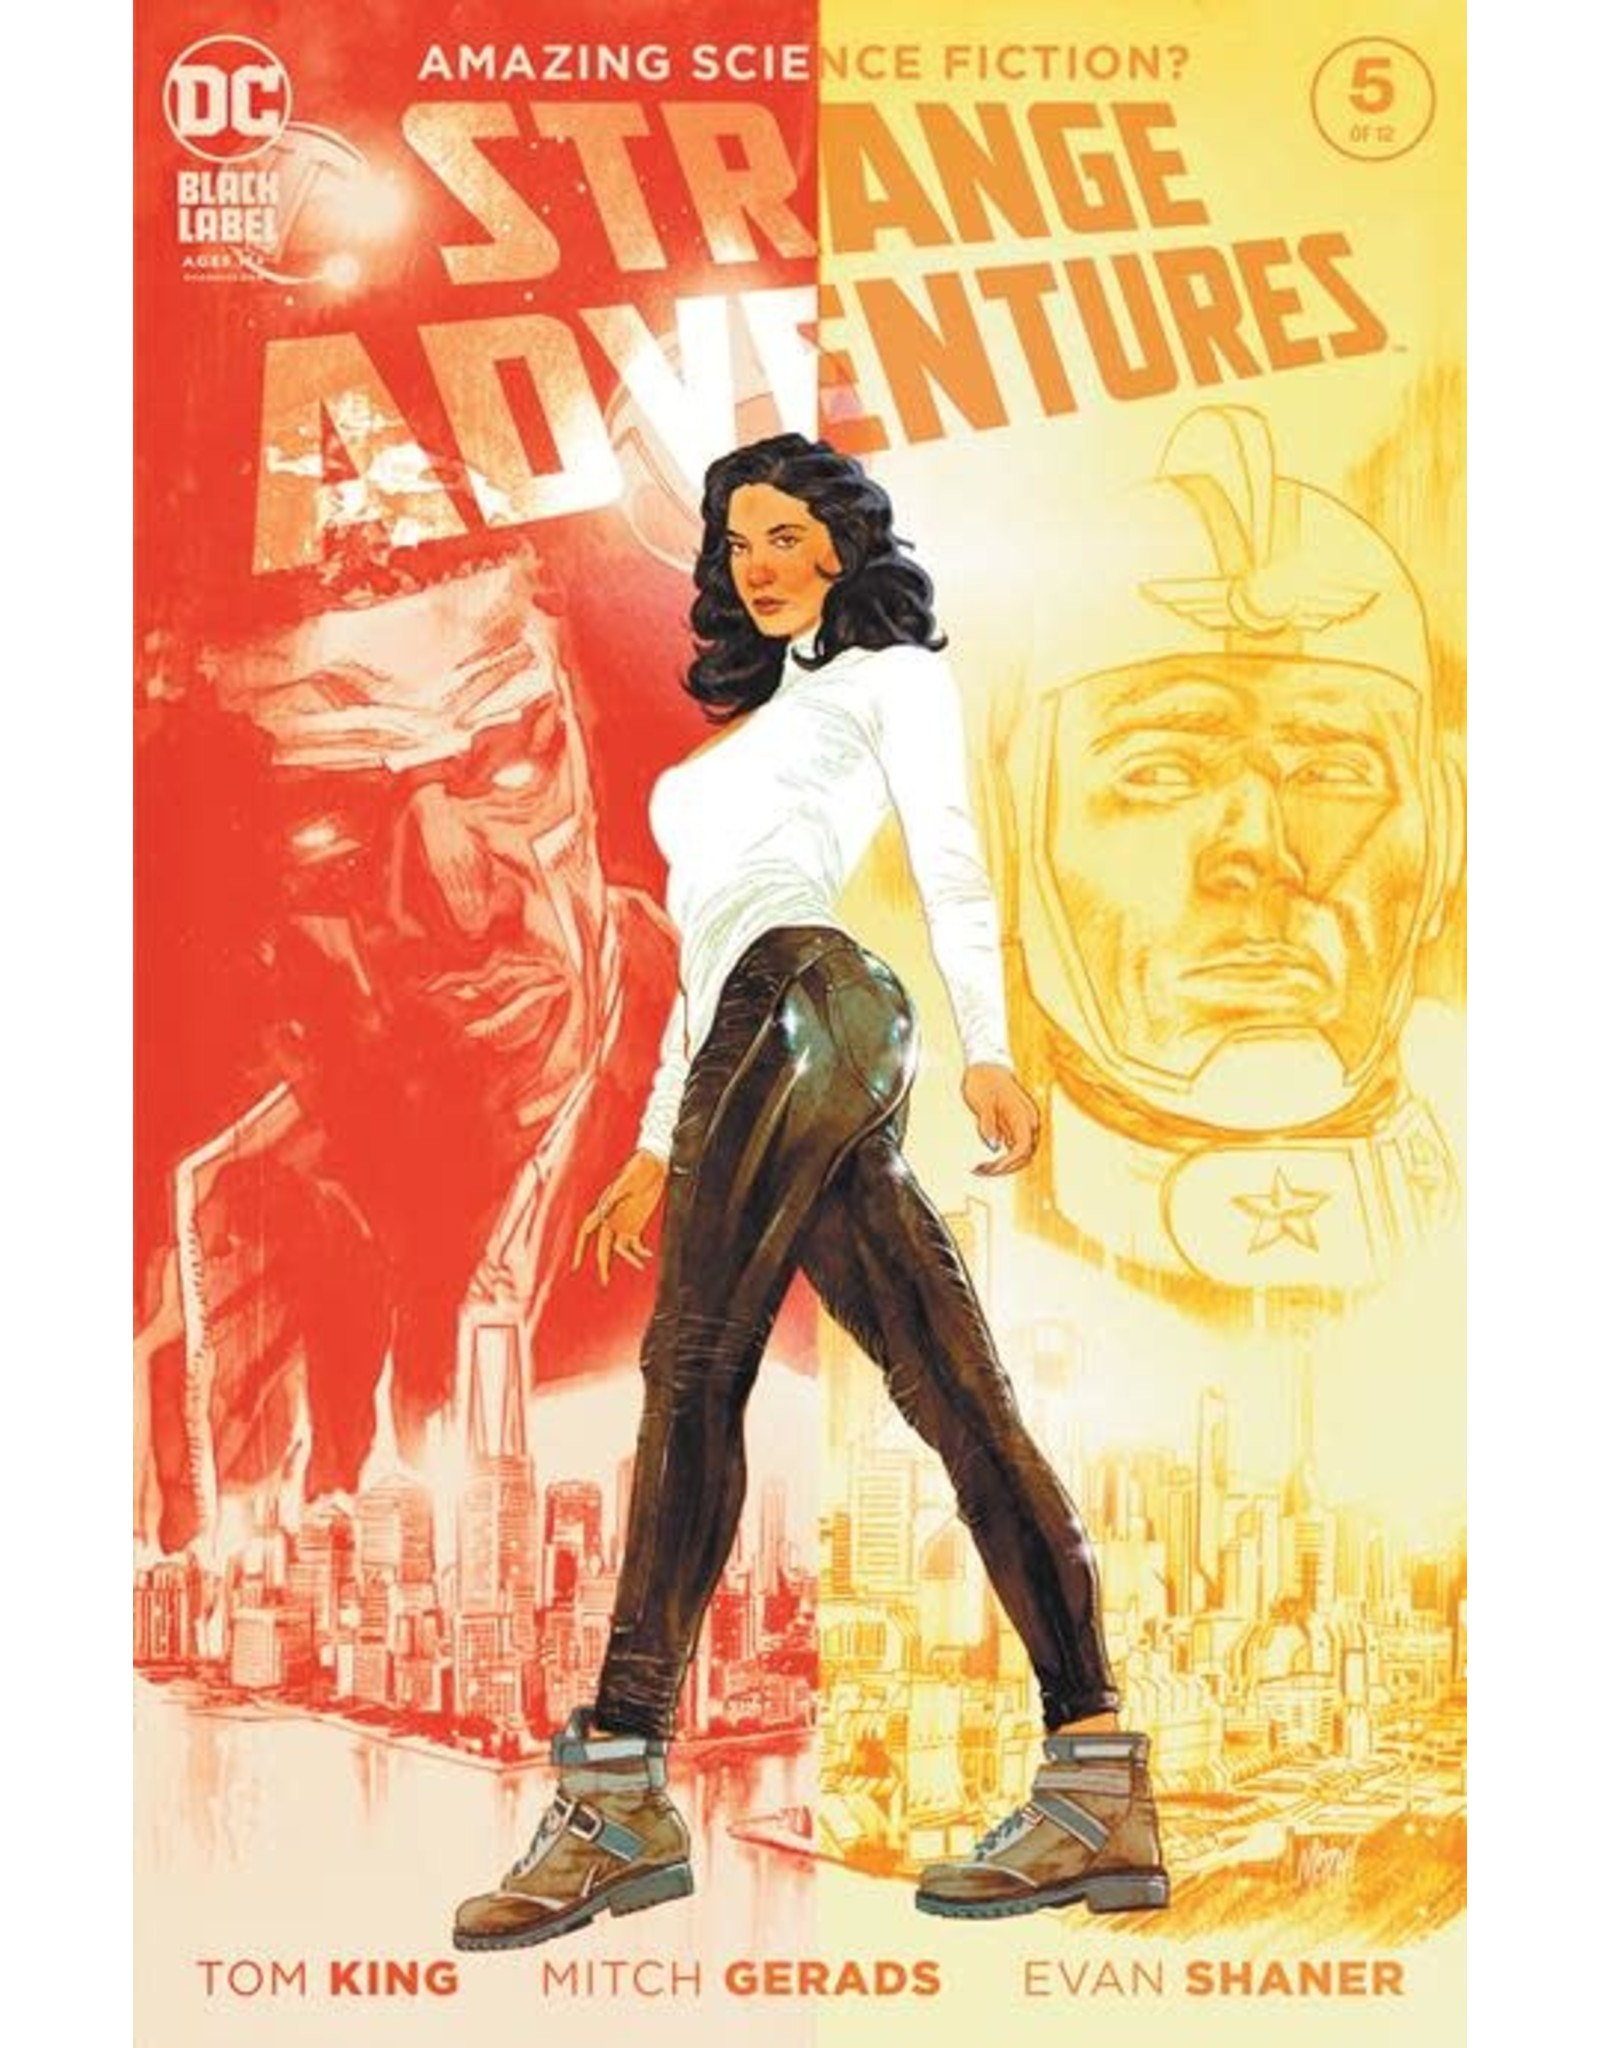 DC Comics STRANGE ADVENTURES #5 (OF 12) CVR A MITCH GERADS (MR)